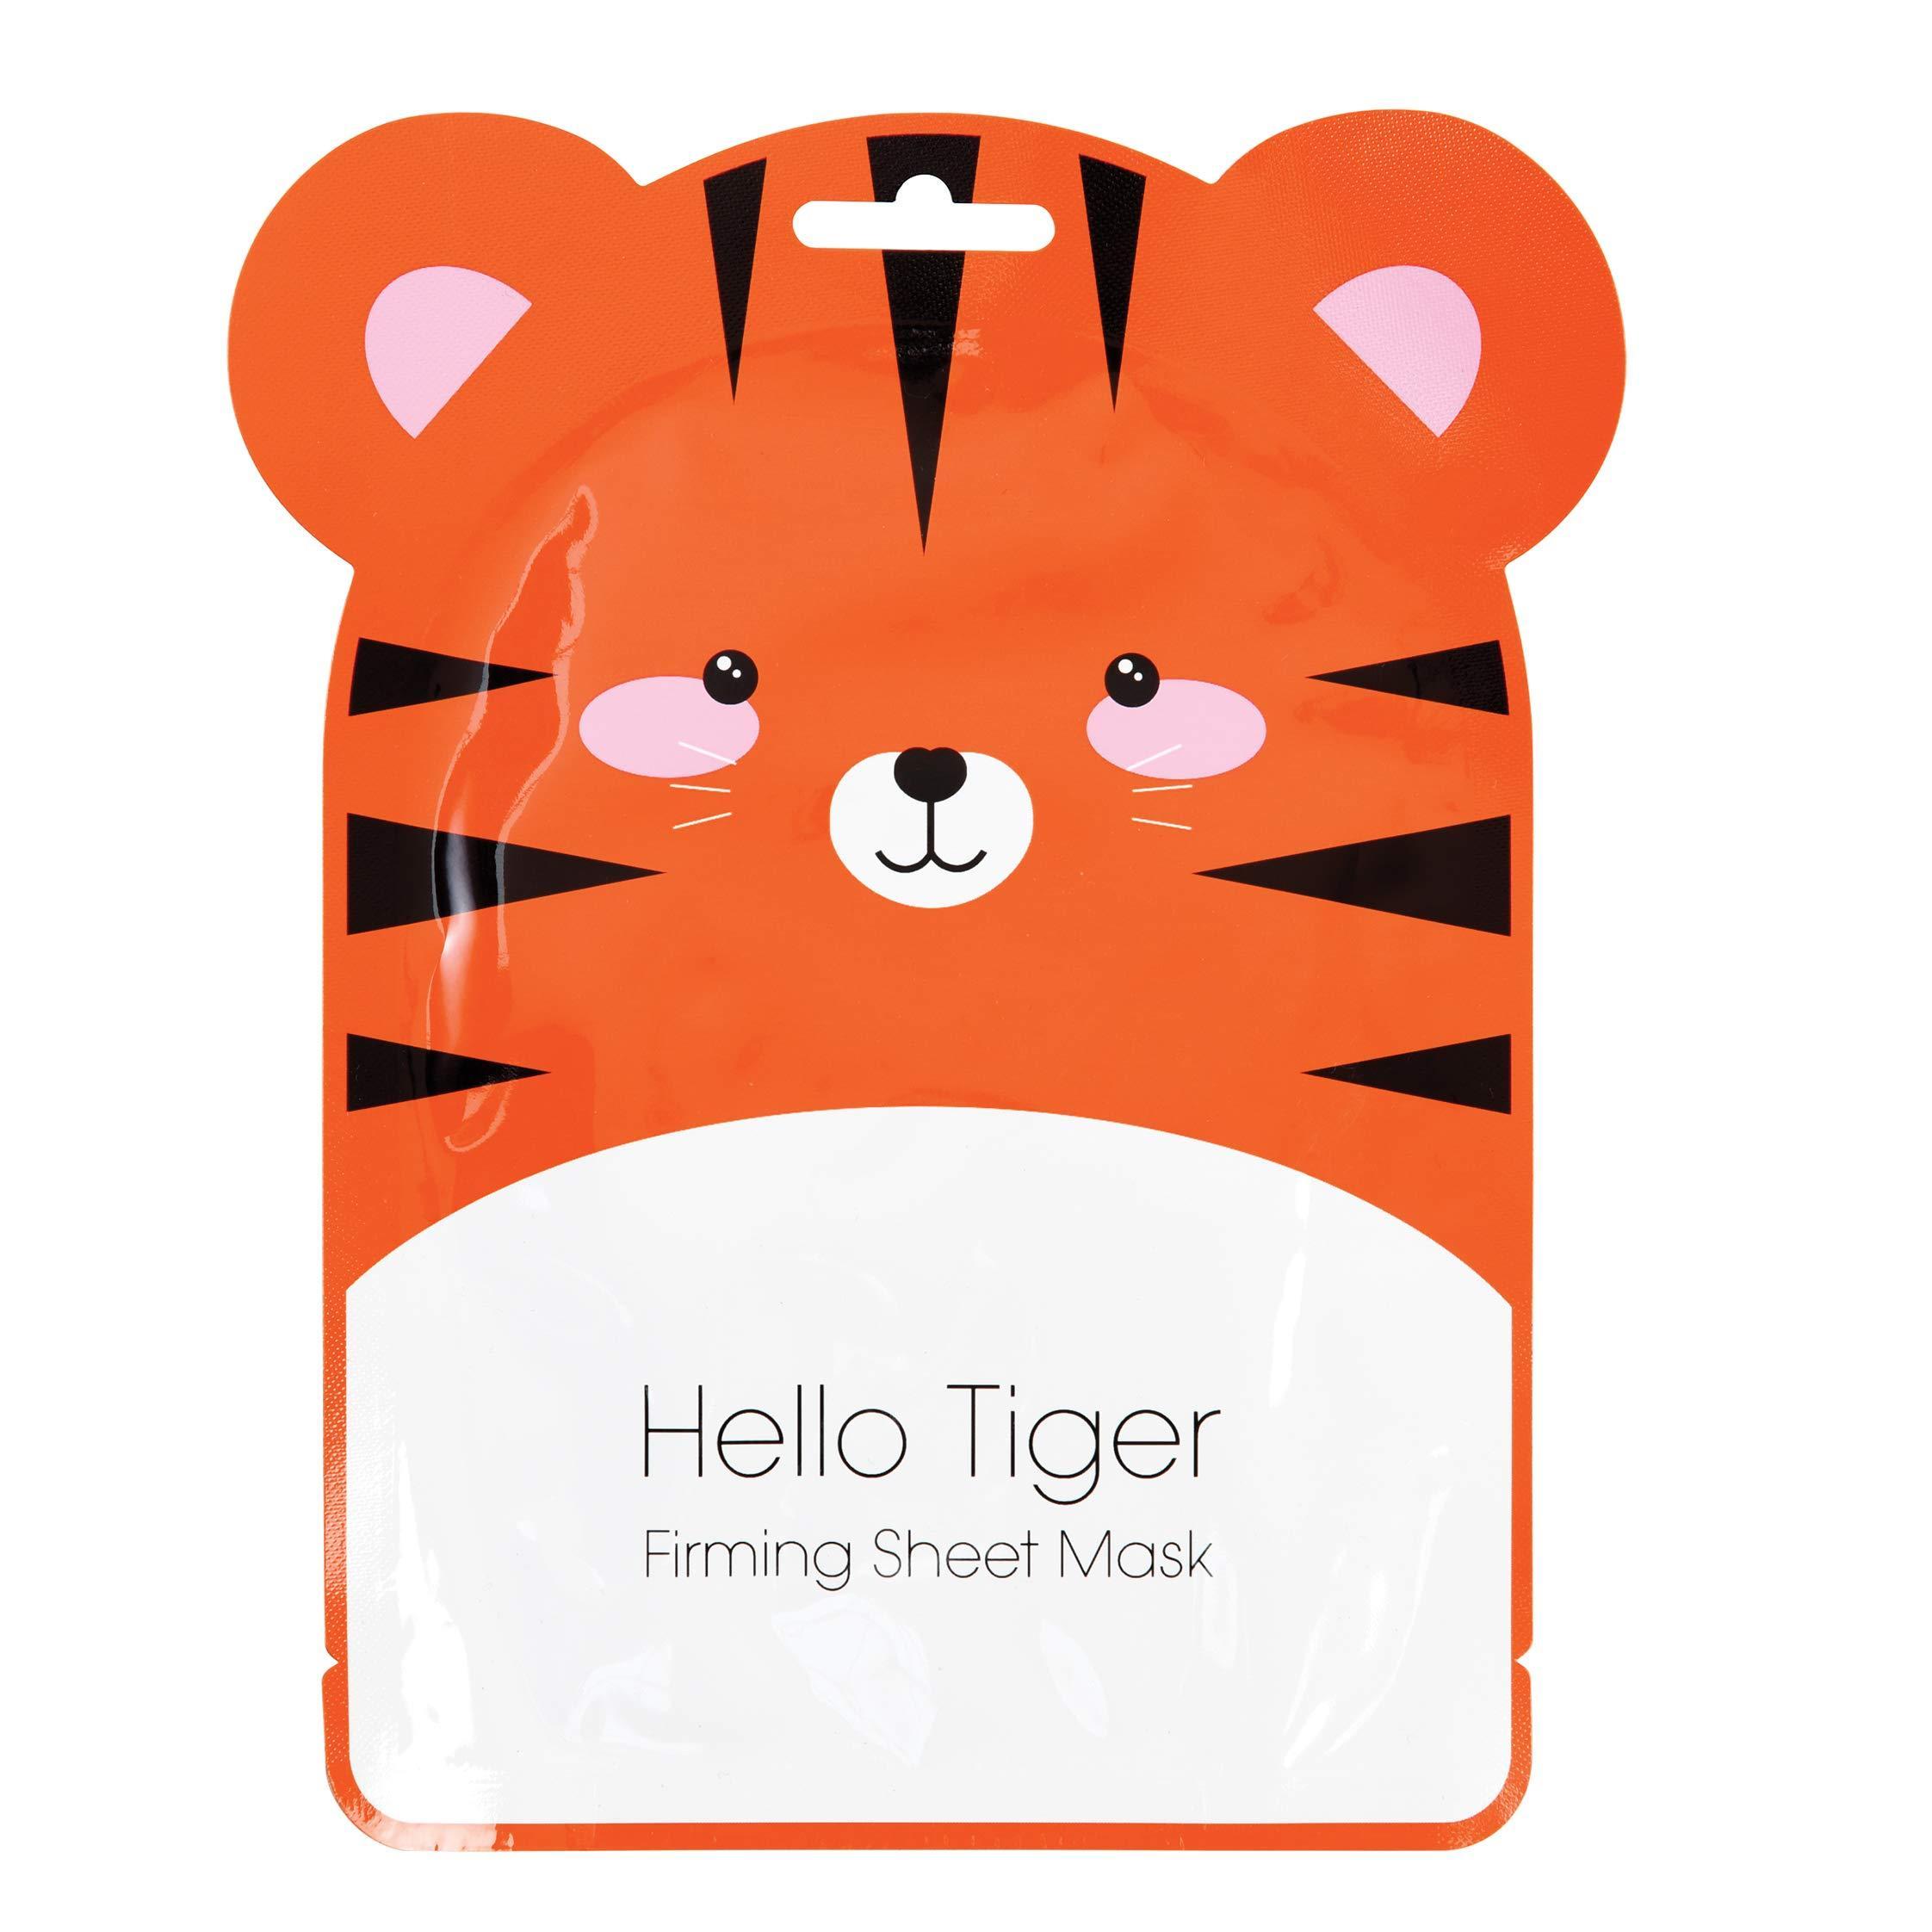 Hello Tiger Korean Made Firming Sheet Face Mask